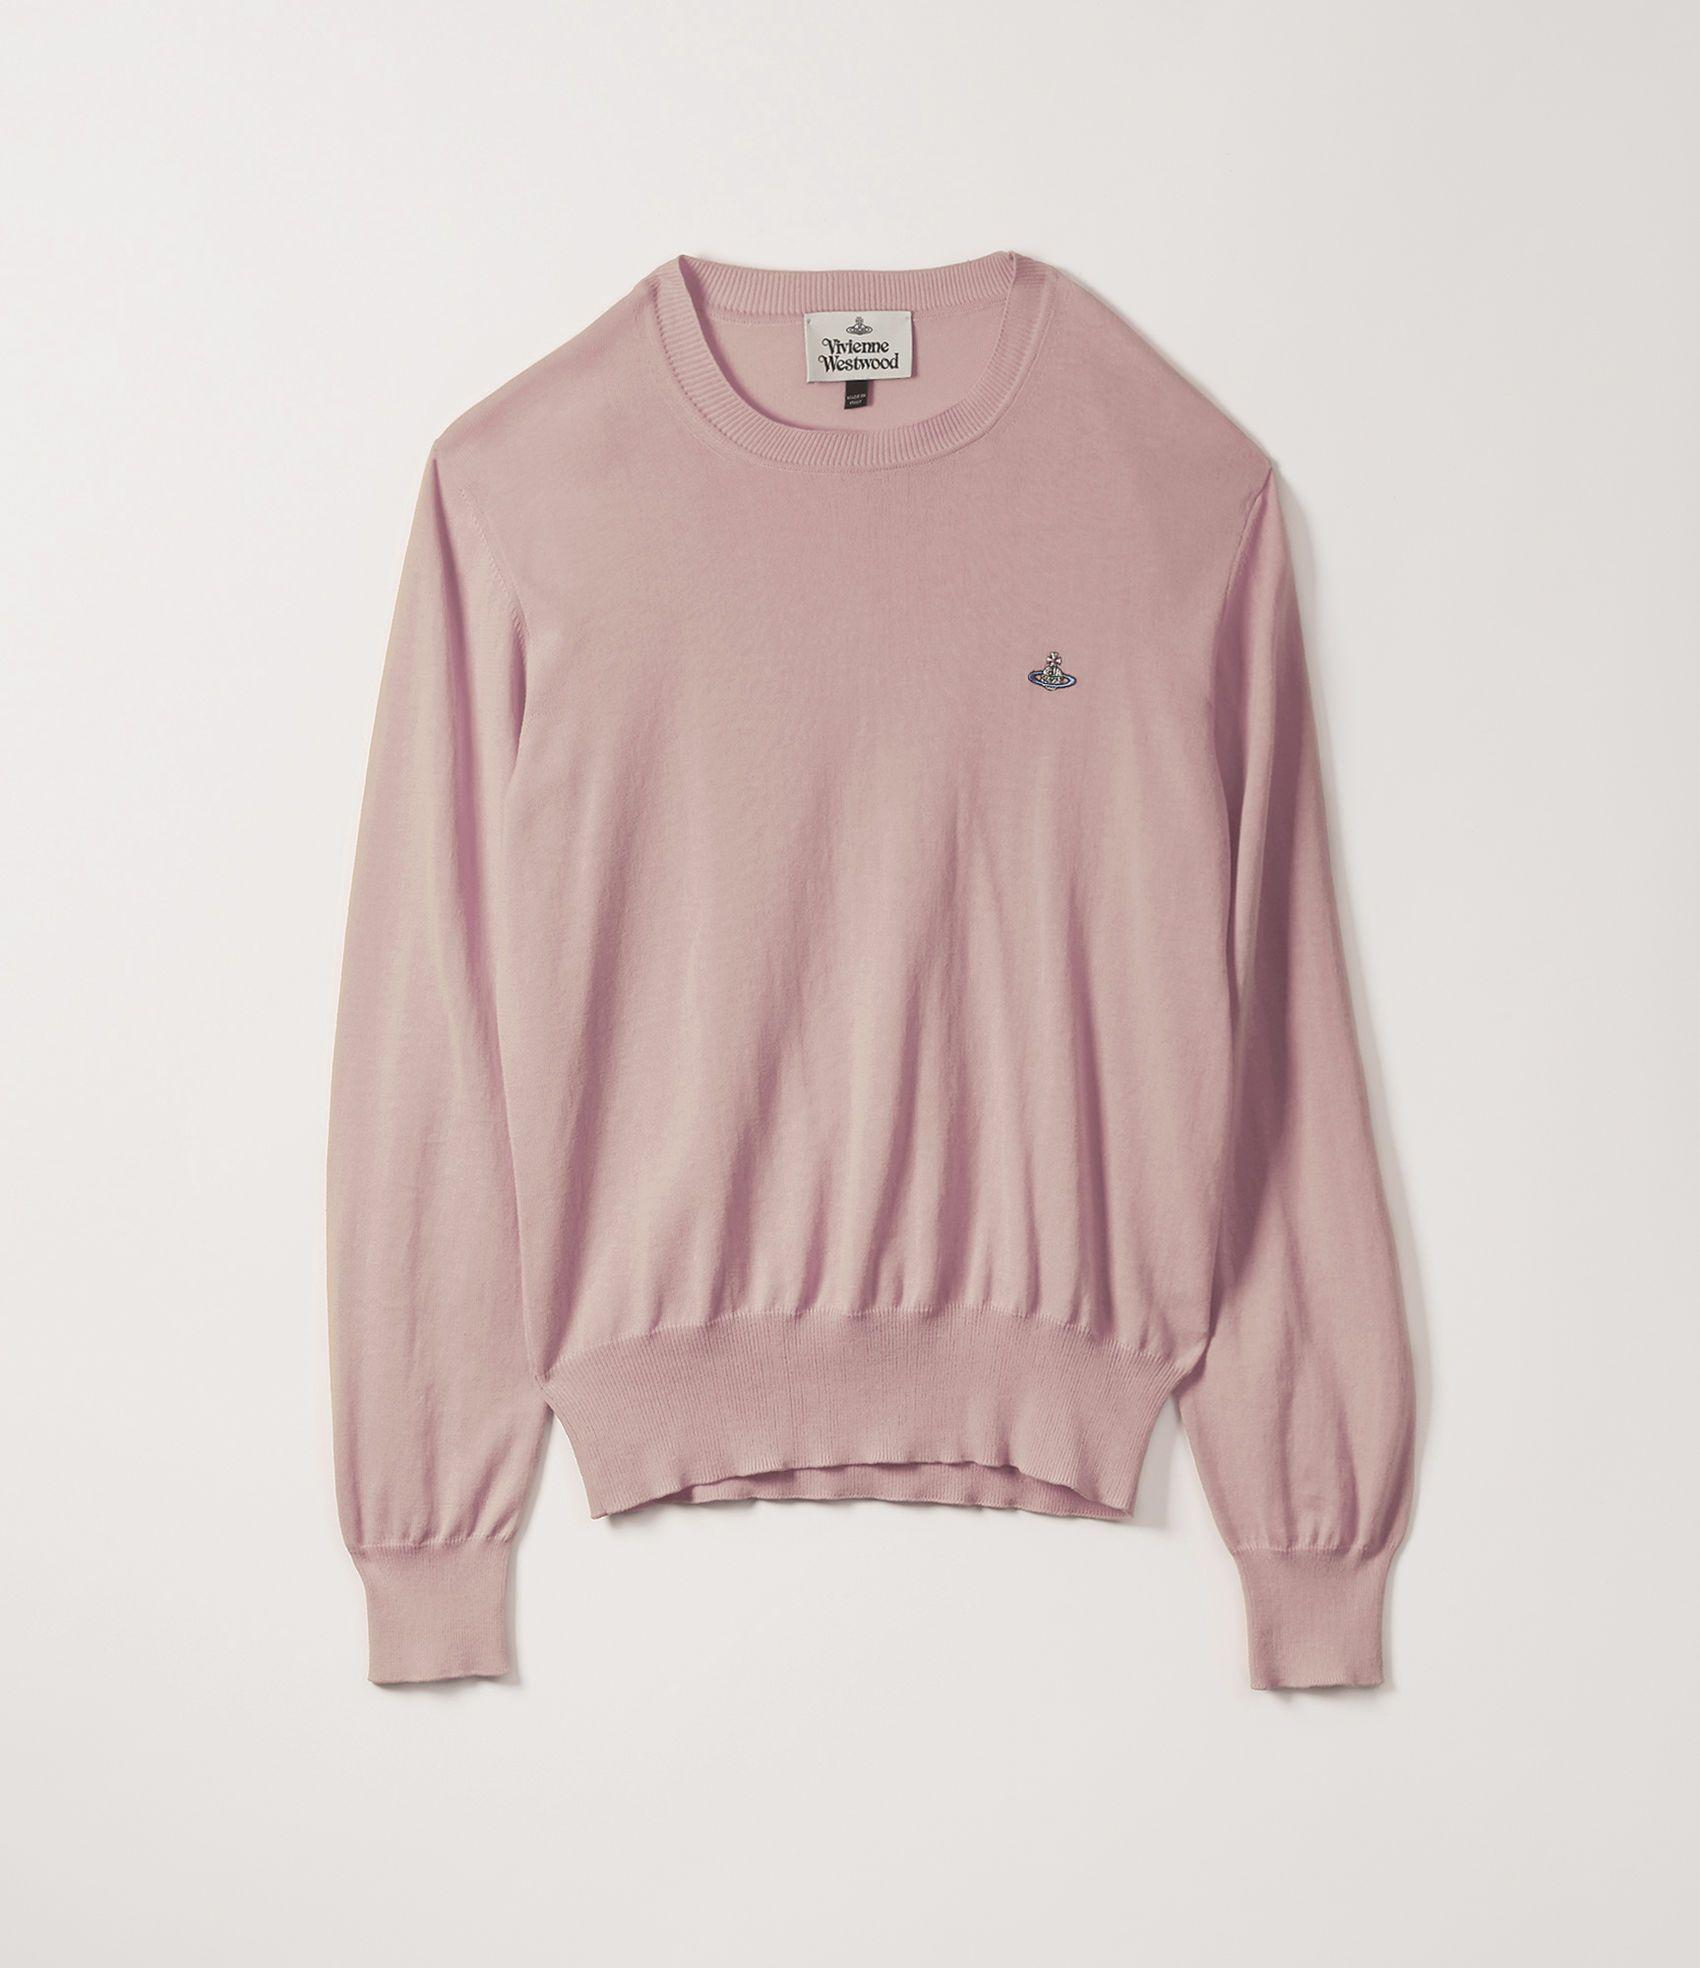 2be59b586e9 VIVIENNE WESTWOOD Roundneck Knit Soft Pink. #viviennewestwood #cloth ...